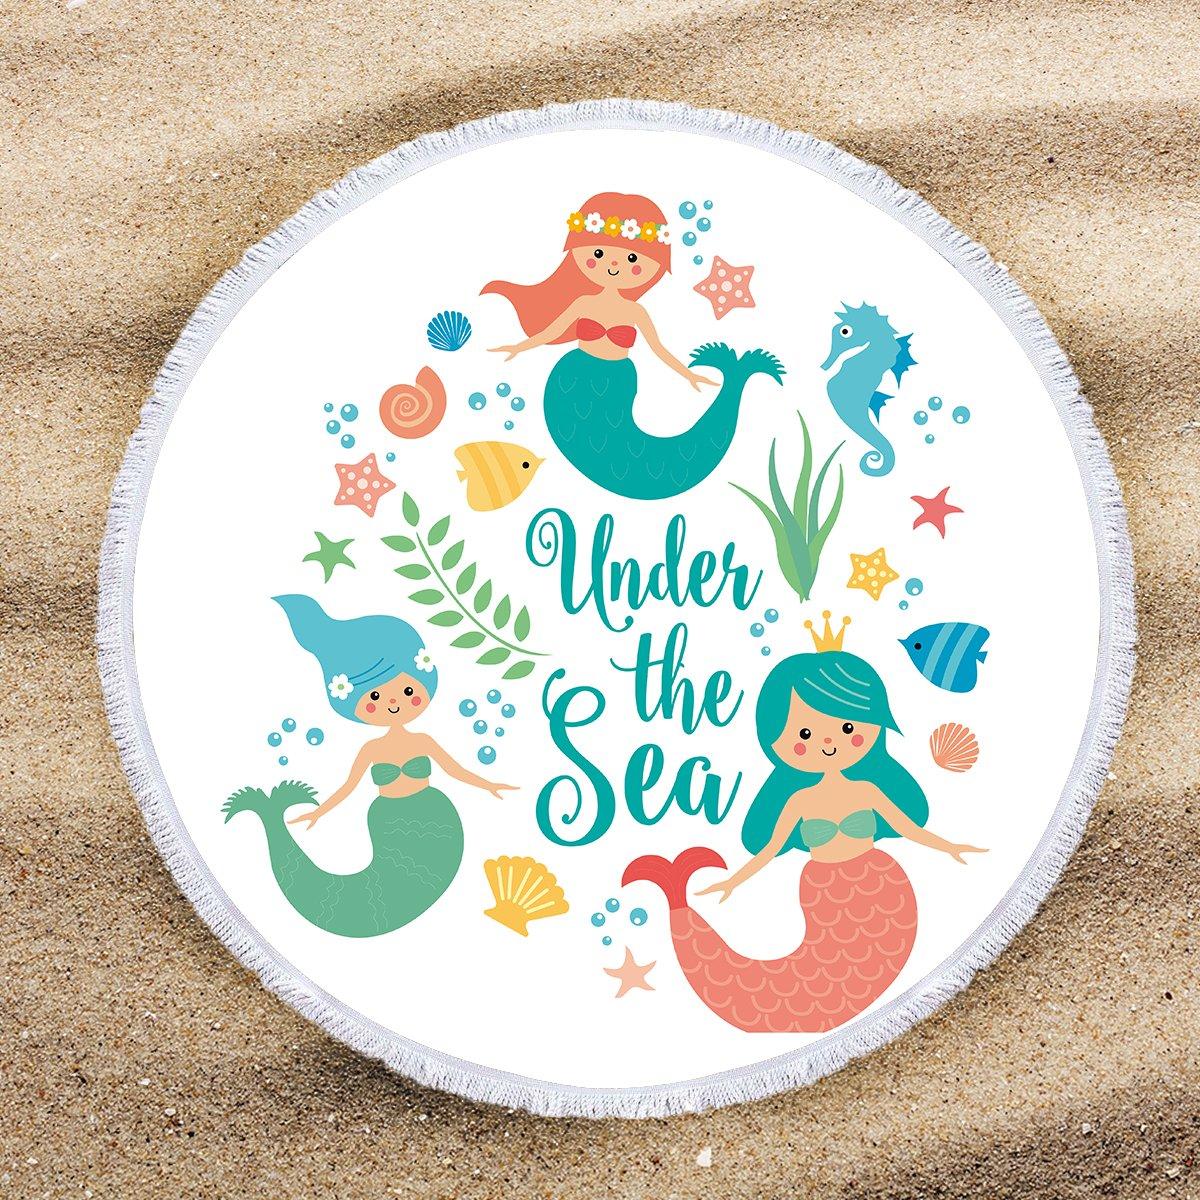 ARIGHTEX Little Mermaid Beach Towel Round Beach Towels for Girls Turquoise Ocean Decor Beach Roundie Fringe